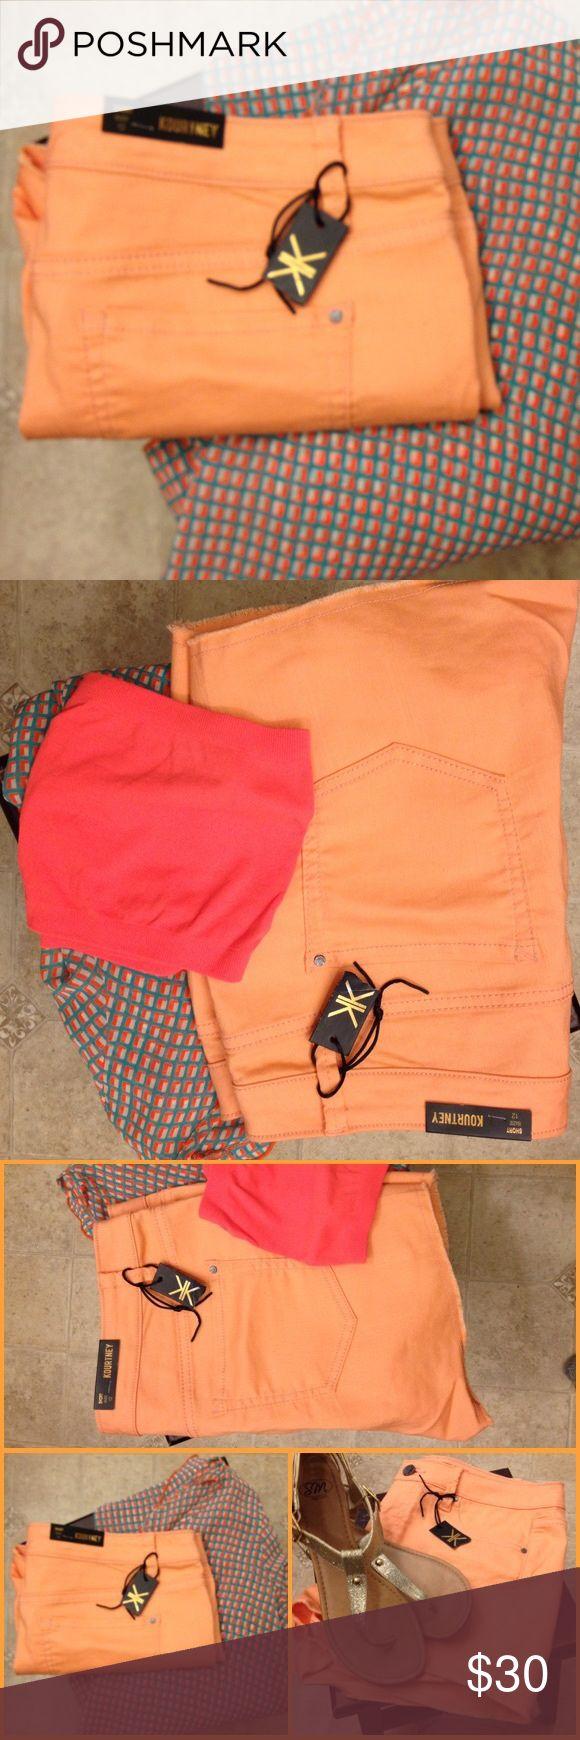 ✨ Kardashian Collection: Shorts✨ NWT Kardashian premium collection. Coral pink, size 12 Kourtney shorts. Kardashian Kollection Shorts Bermudas